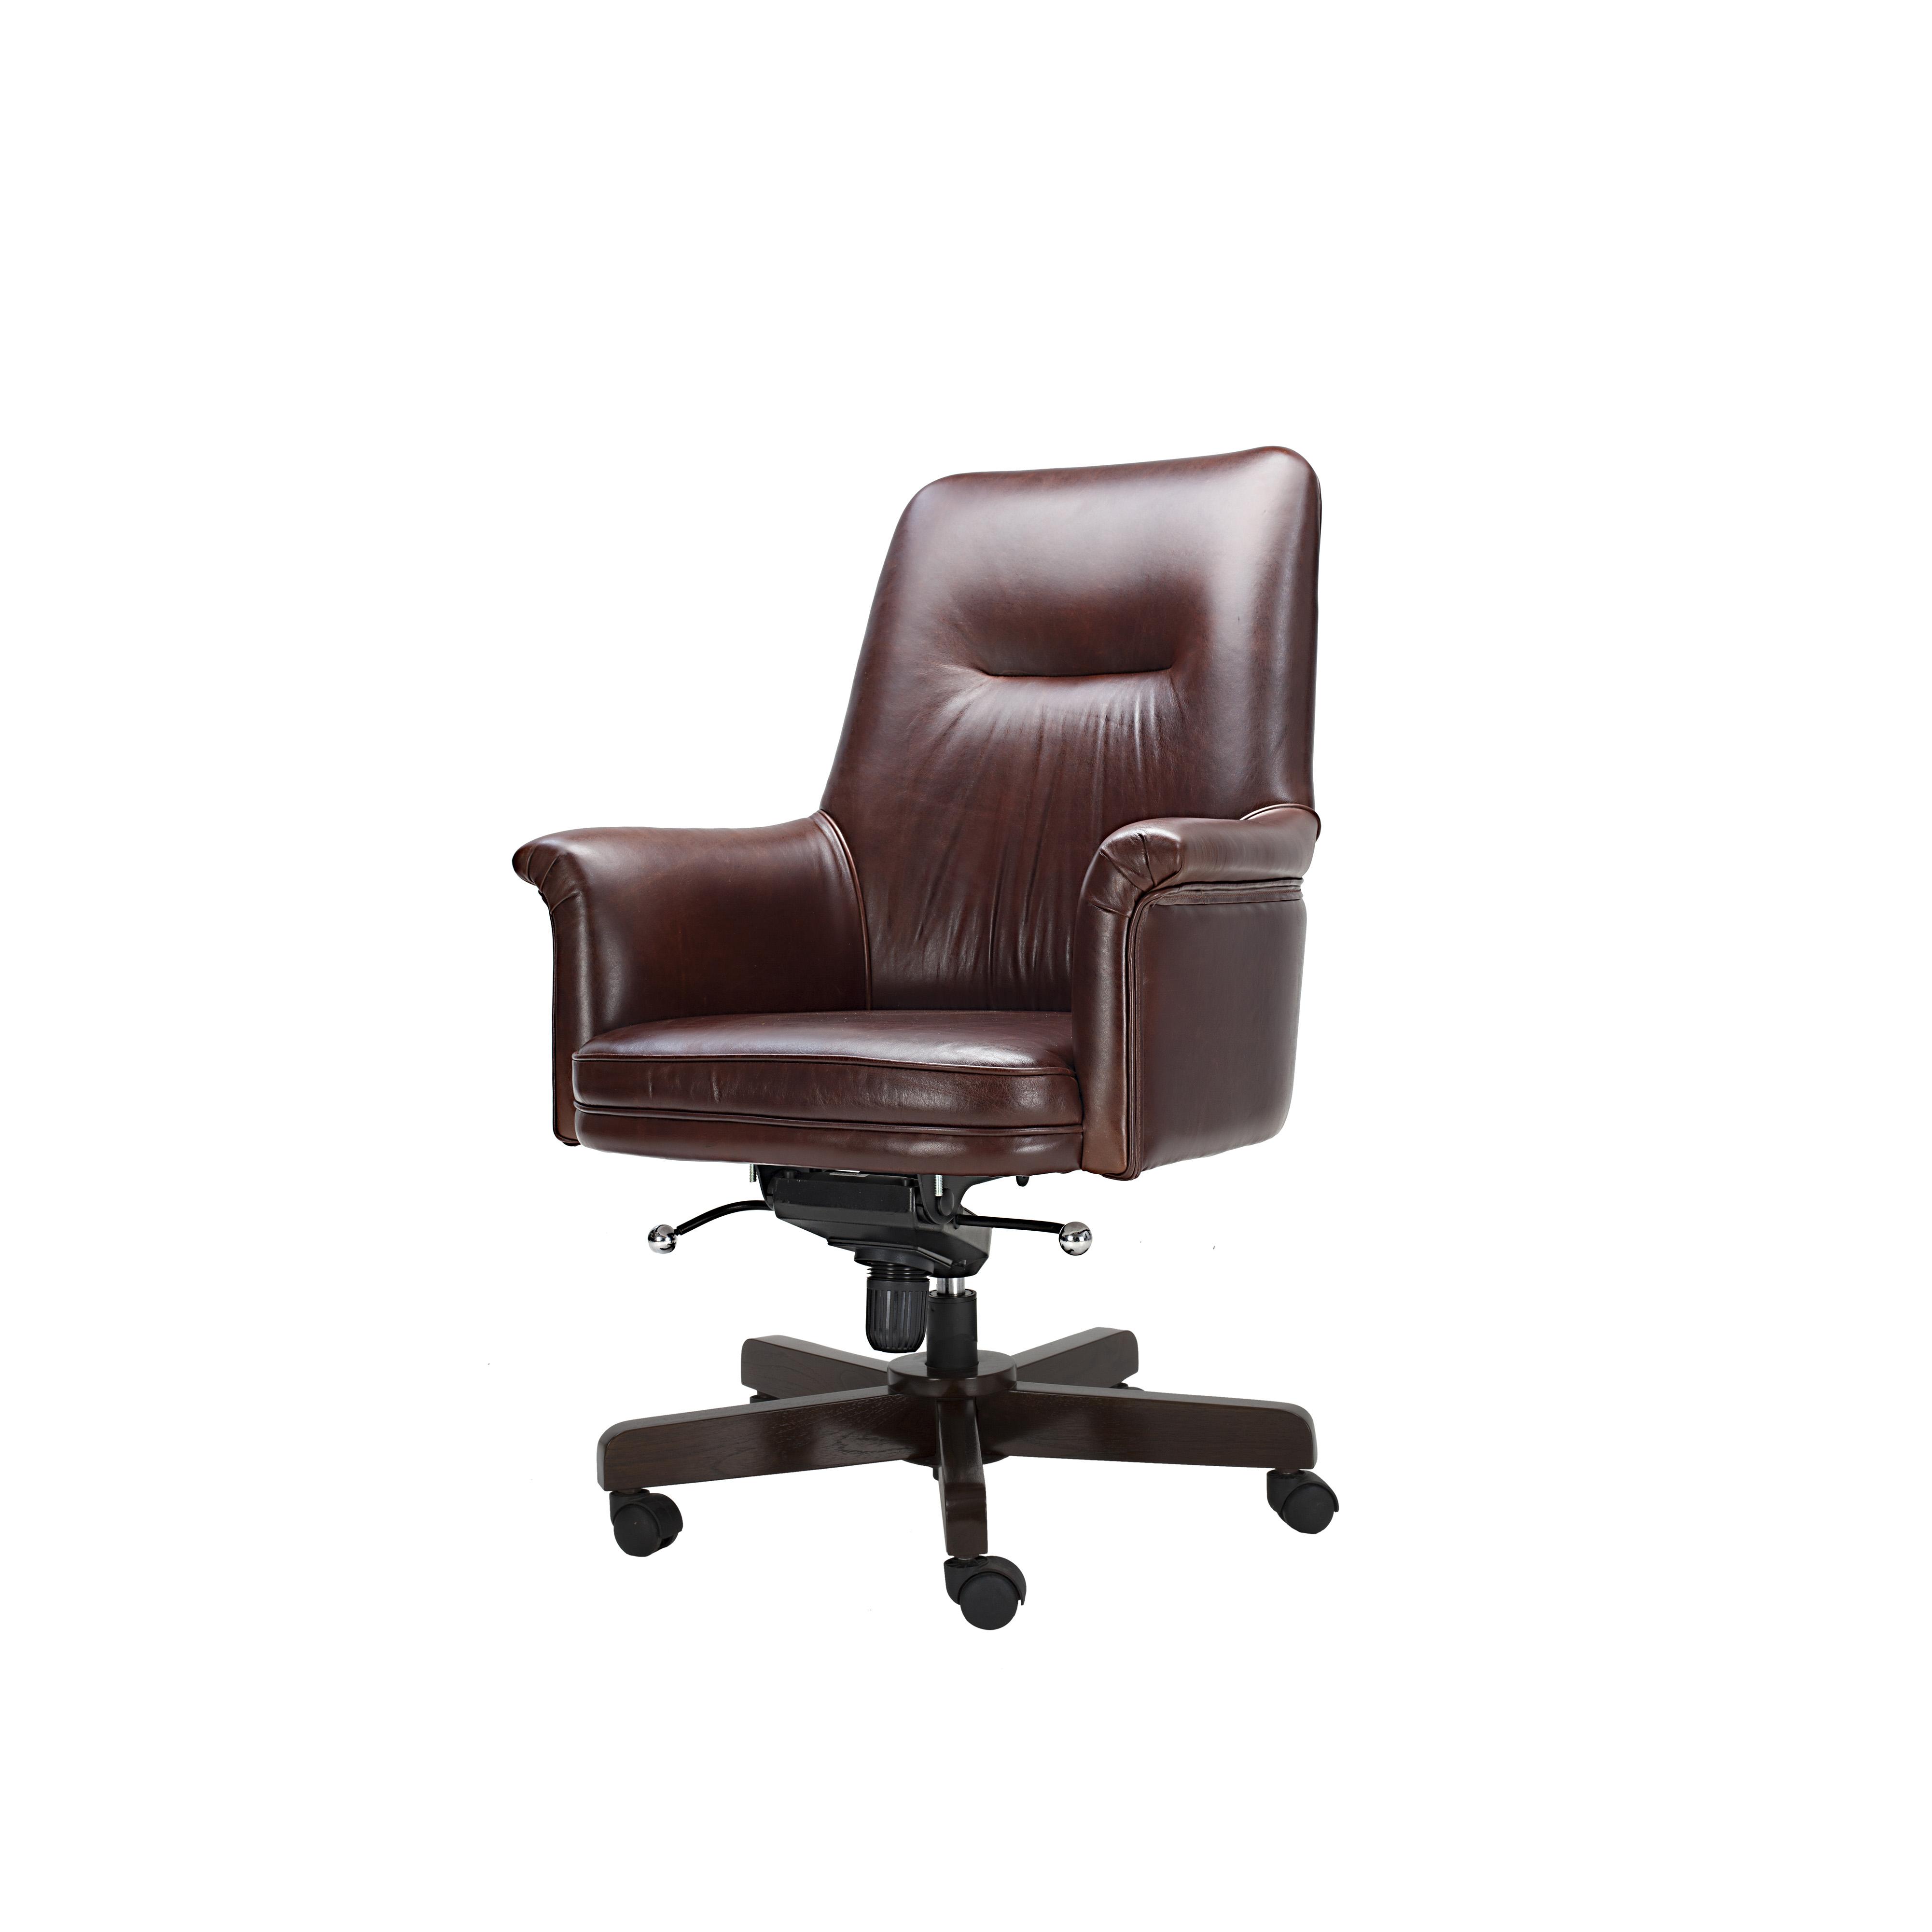 Prima swivel chair